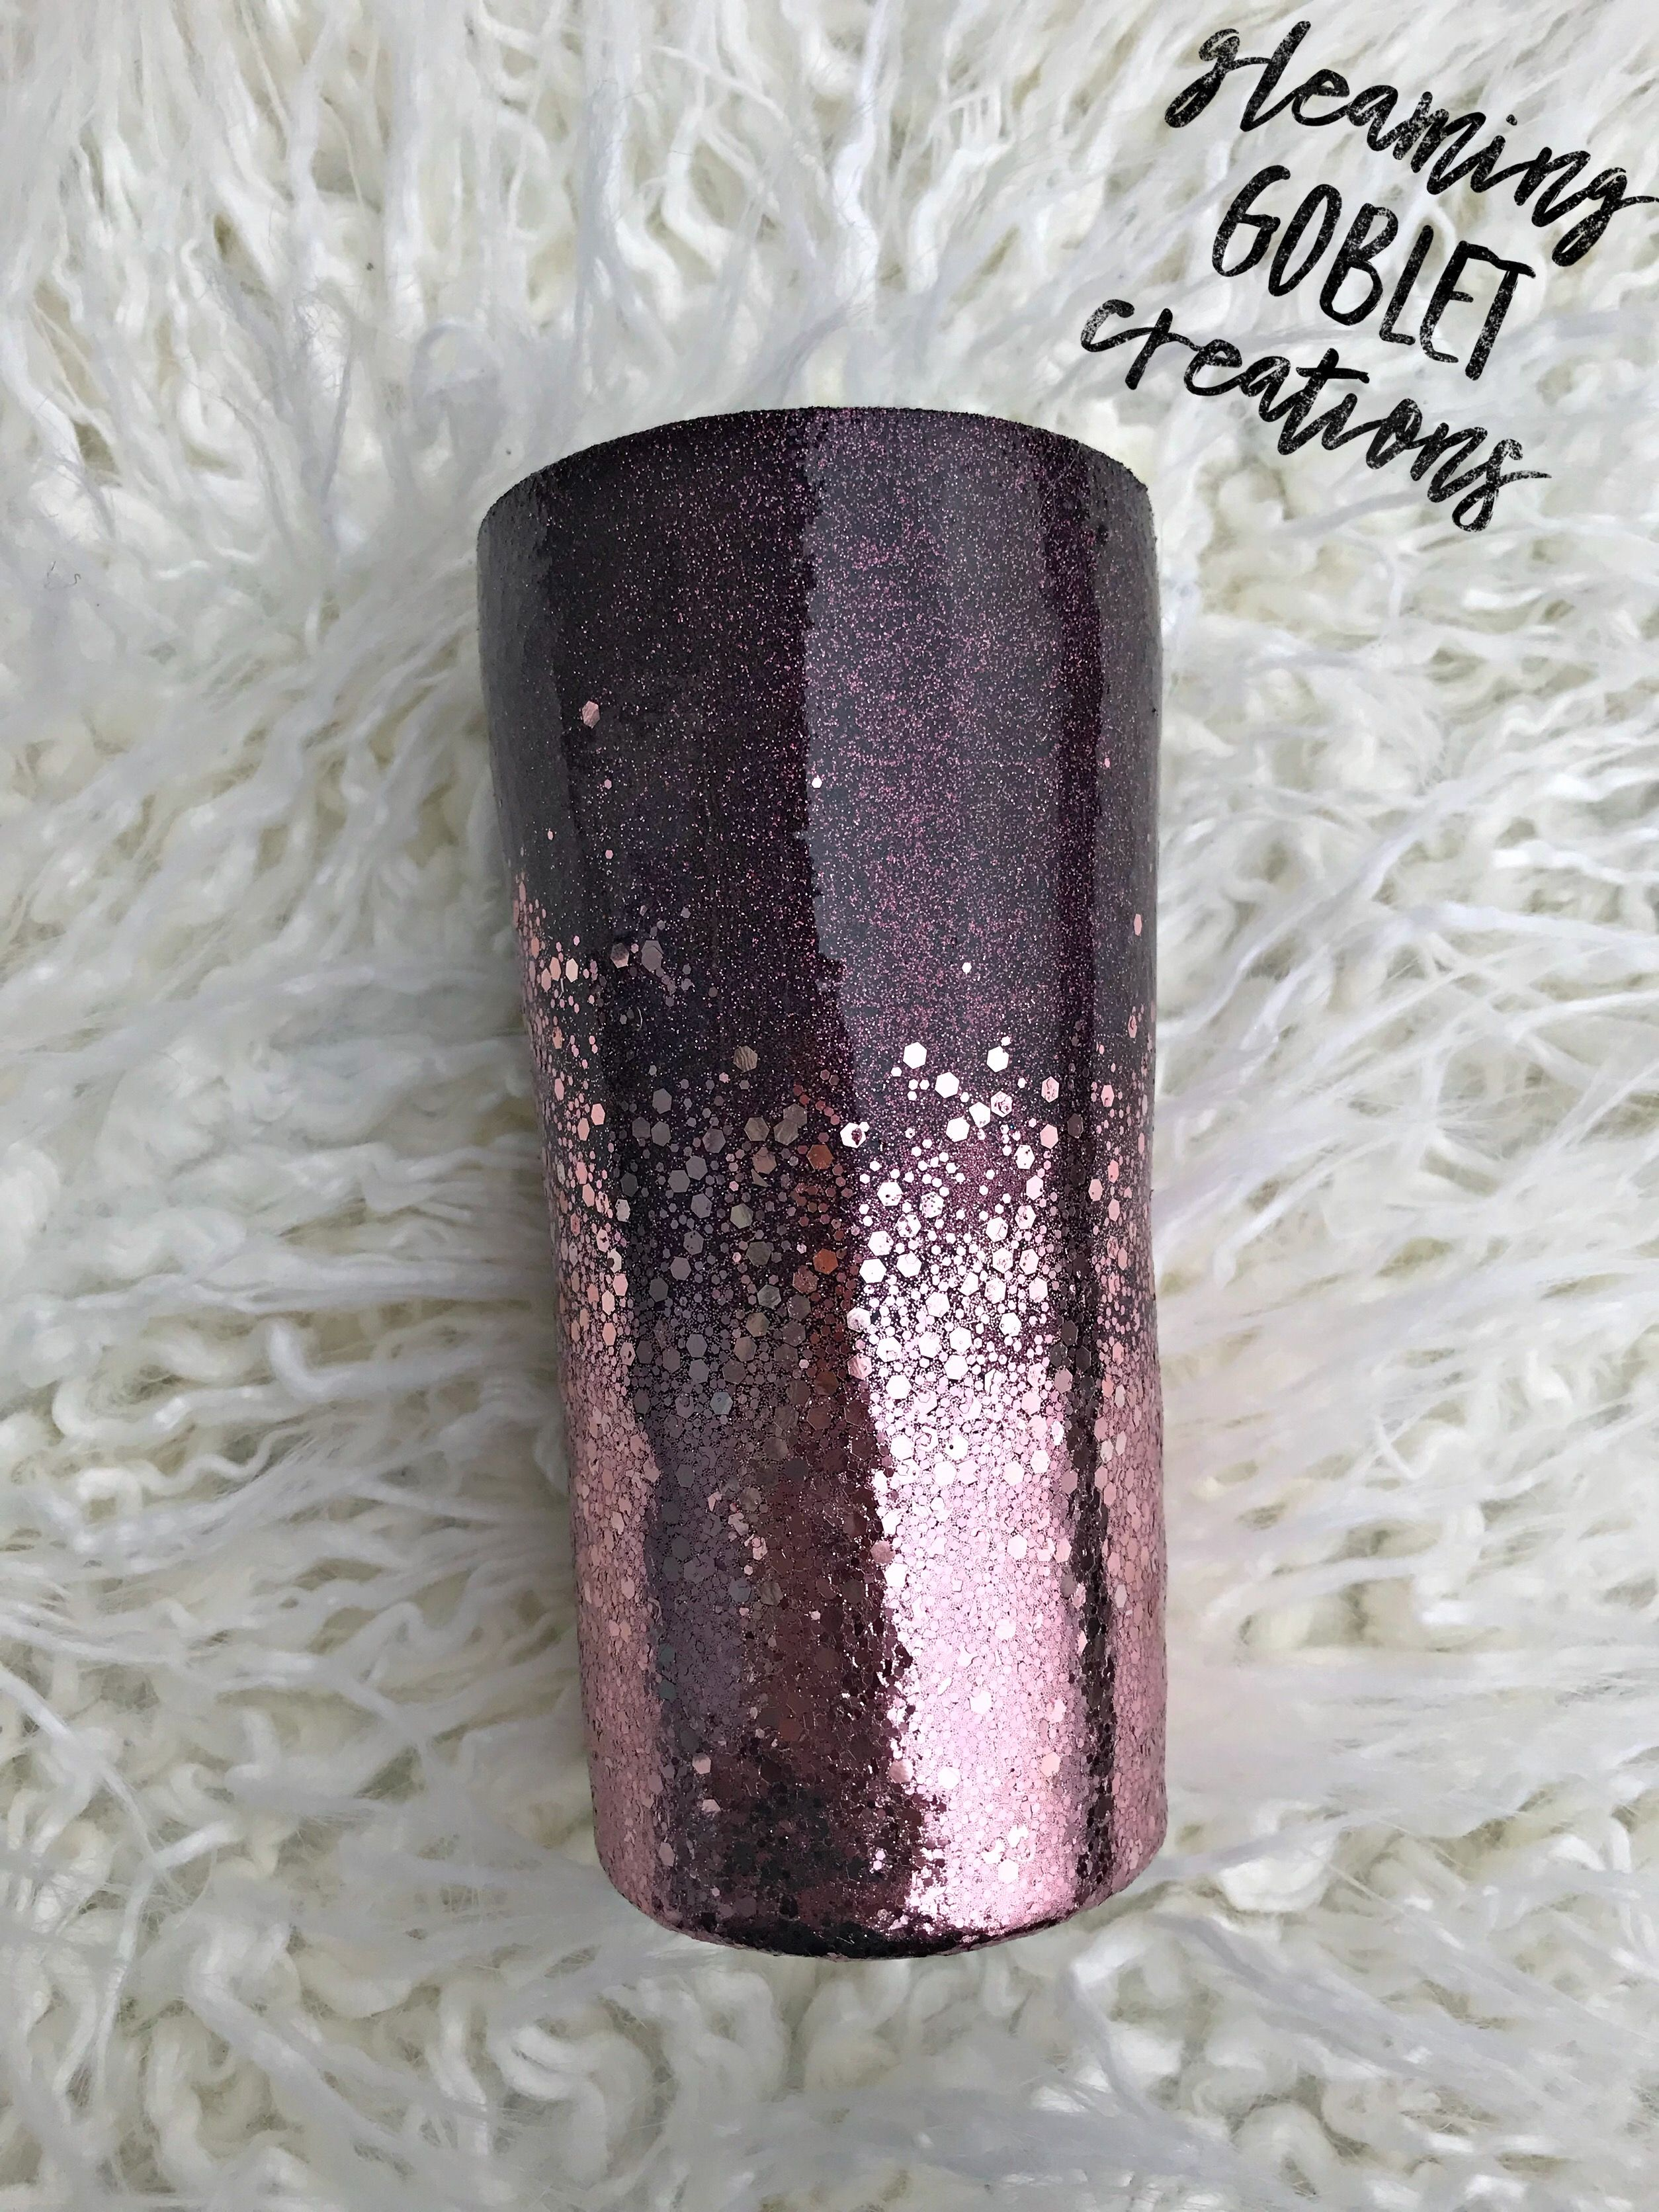 a0a53e5d407 Glitter tumbler Www.facebook.com/gleaminggobletcreations | tumblers ...